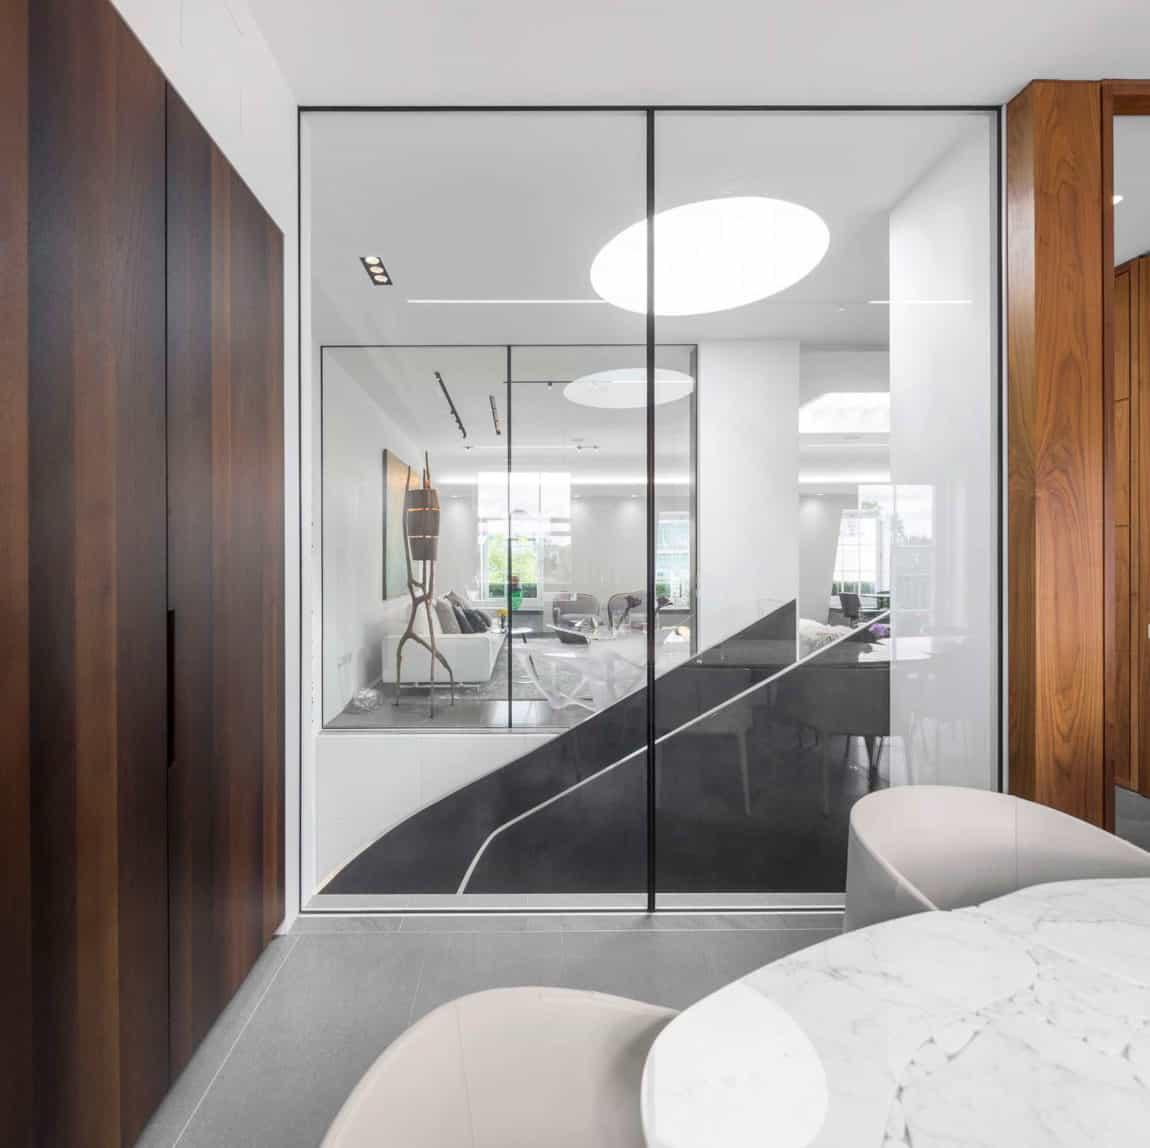 London Penthouse by Fernanda Marques Arquitetos Assoc (8)